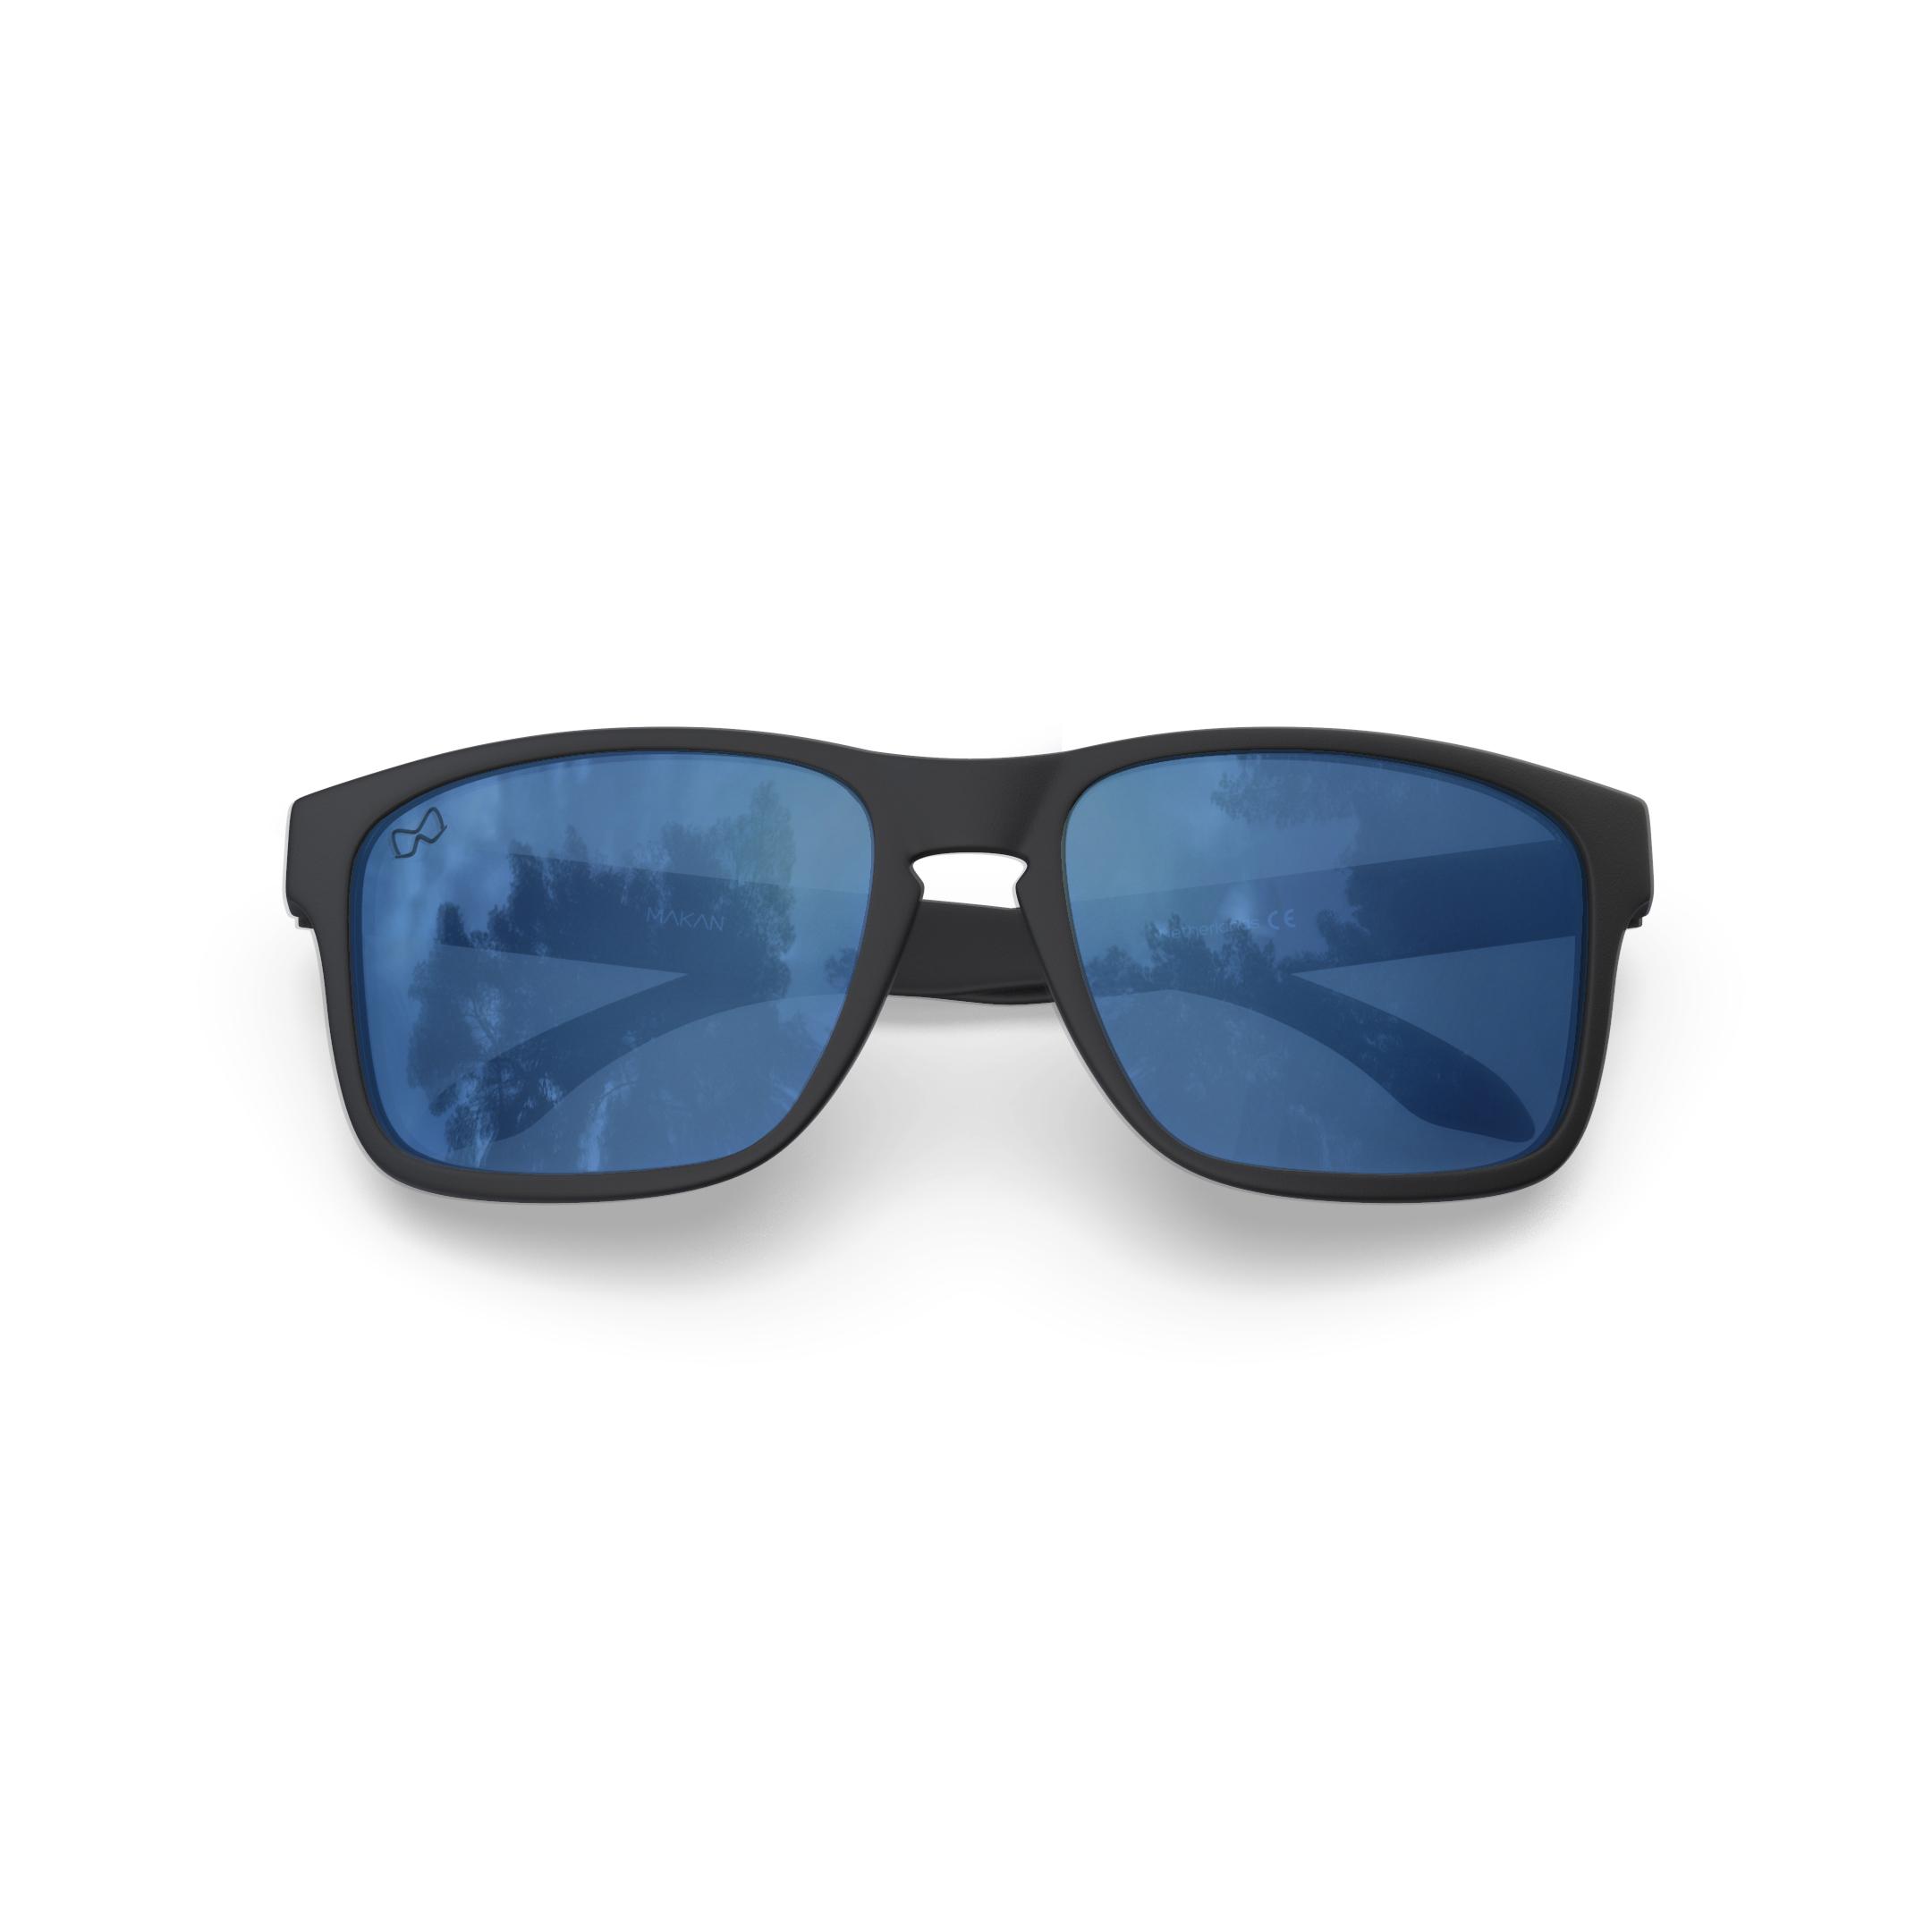 Mariener-Melange-Makan-Matte-Black-Rubber-Azure-Lens-Adult-Sunglasses-Zonnebril-Volwassenen-Folded